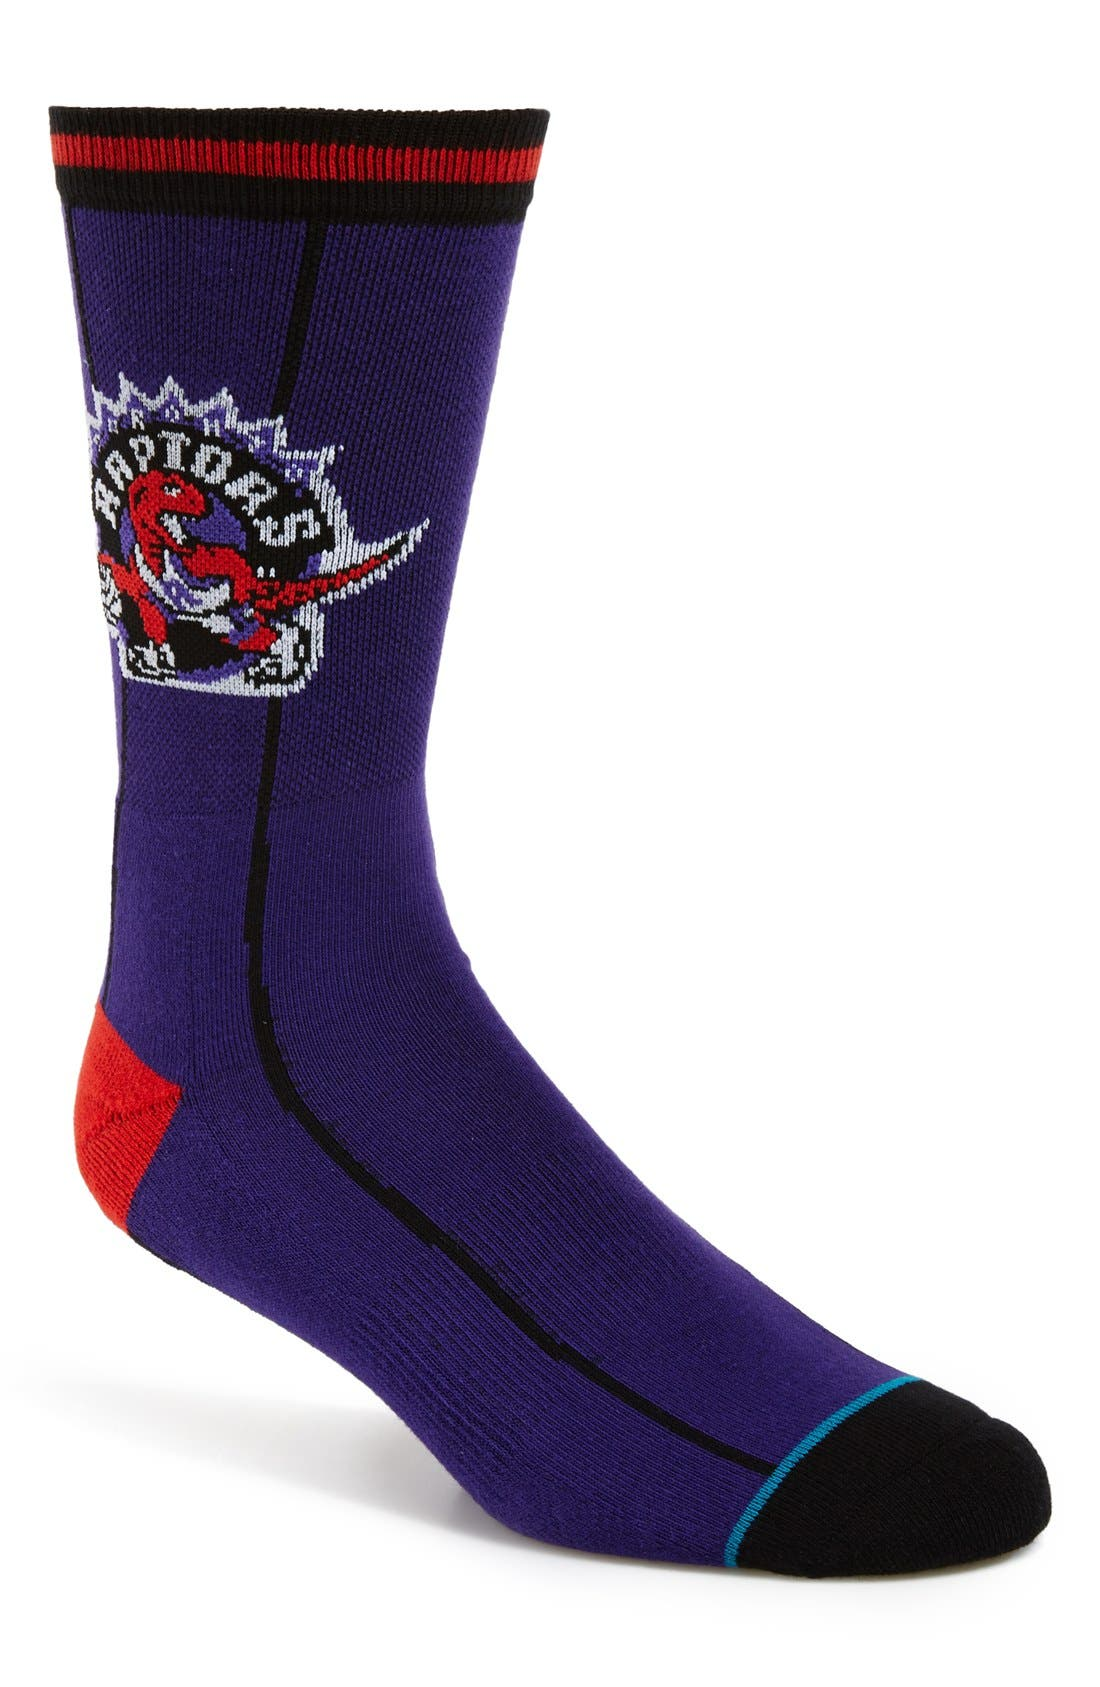 'Toronto Raptors - NBA Legends' Socks,                             Main thumbnail 1, color,                             510